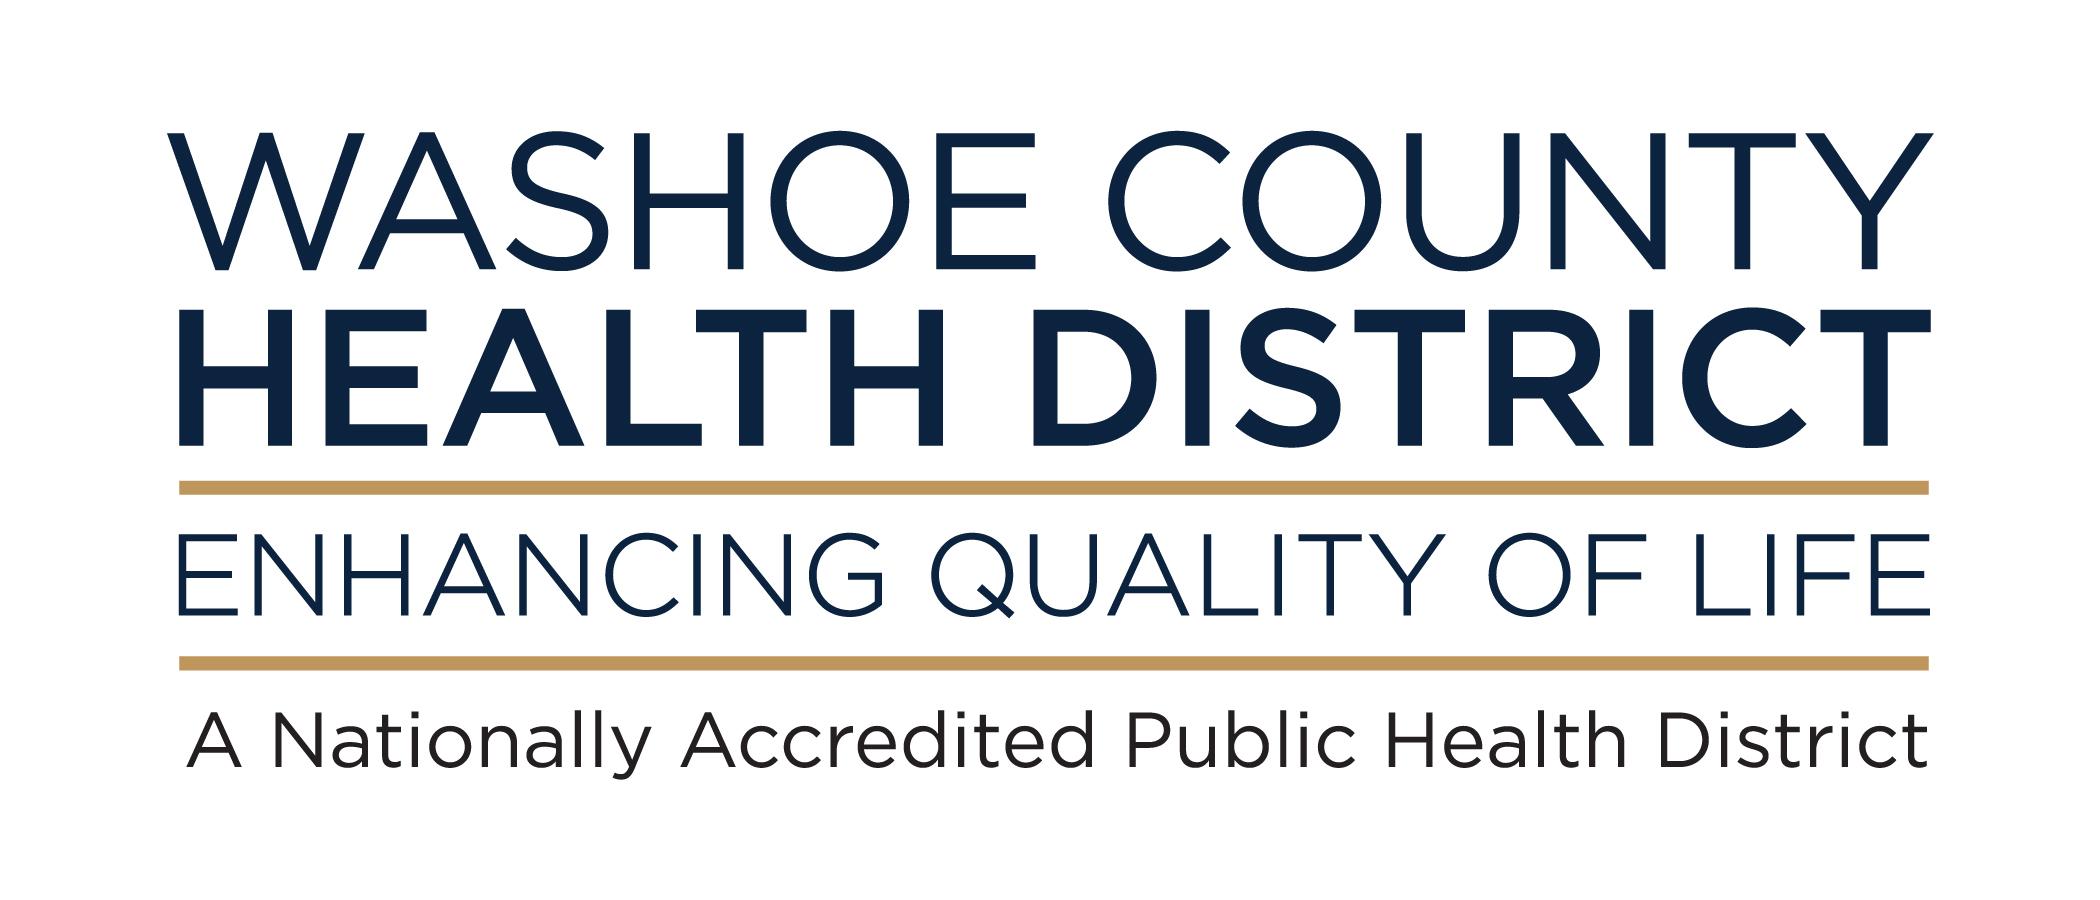 Washoe County Health District